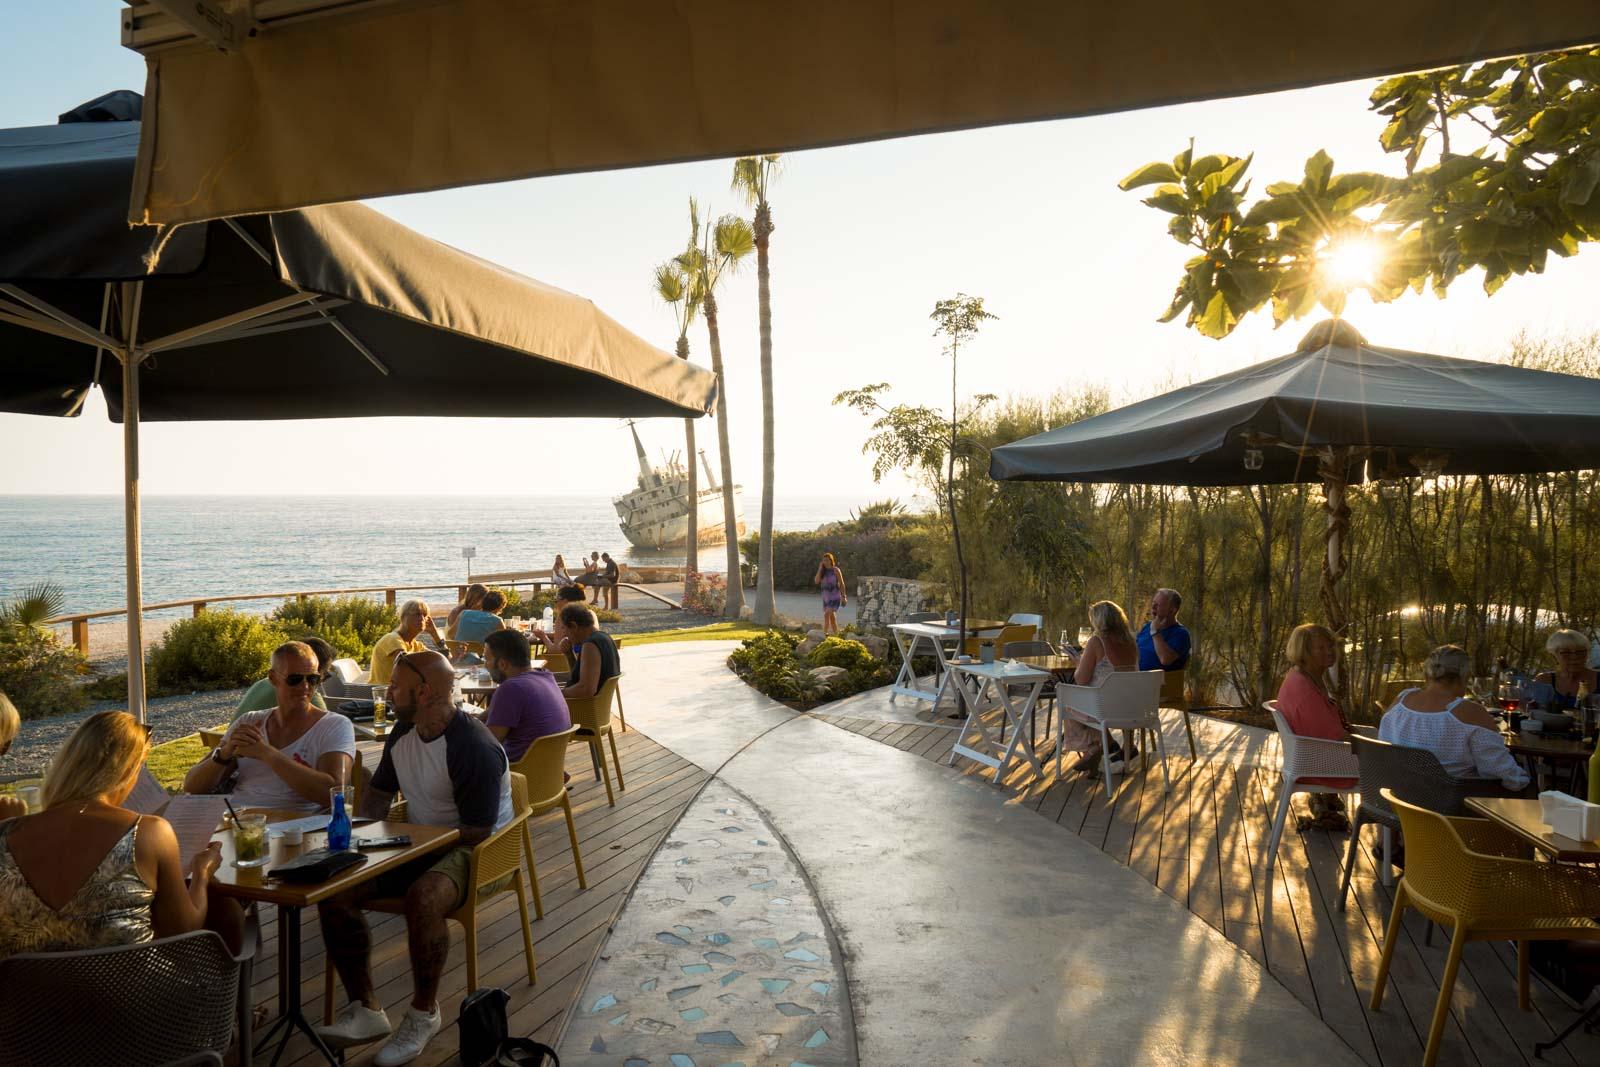 Bar Onori, Pafos, Cyprus